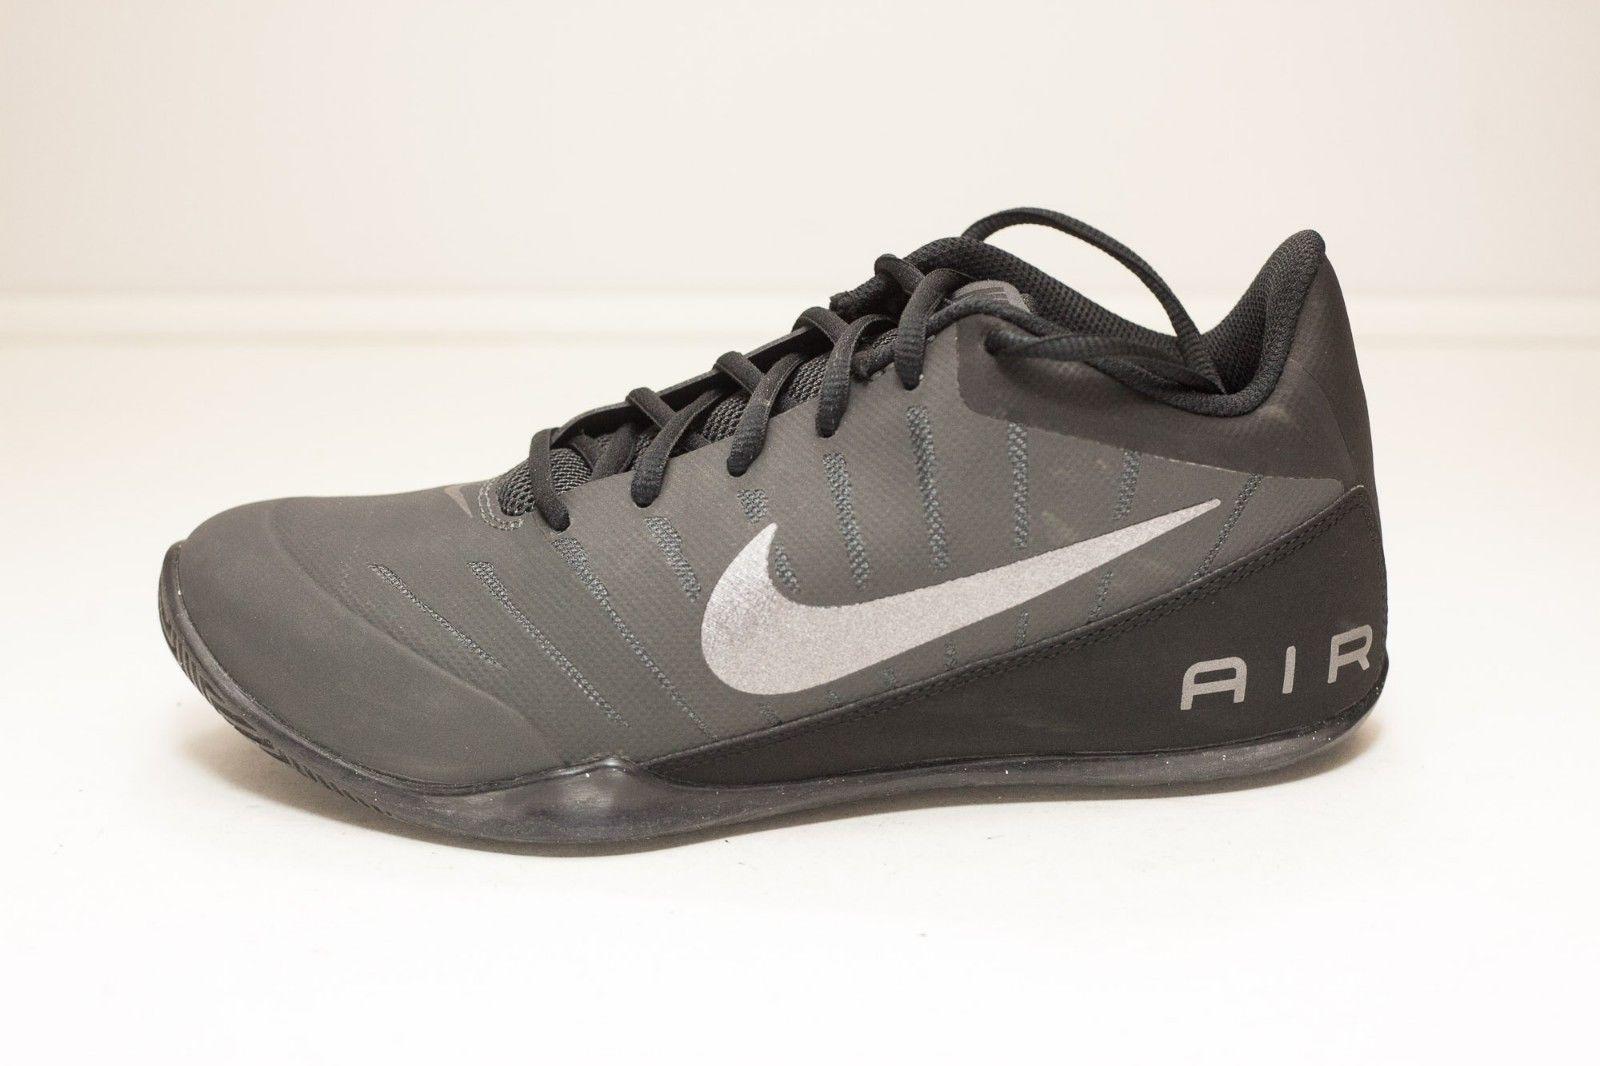 uk availability 9b160 4b70d ... Nike Air Mavin Size 7 Gray Basketball Shoes Men s ...